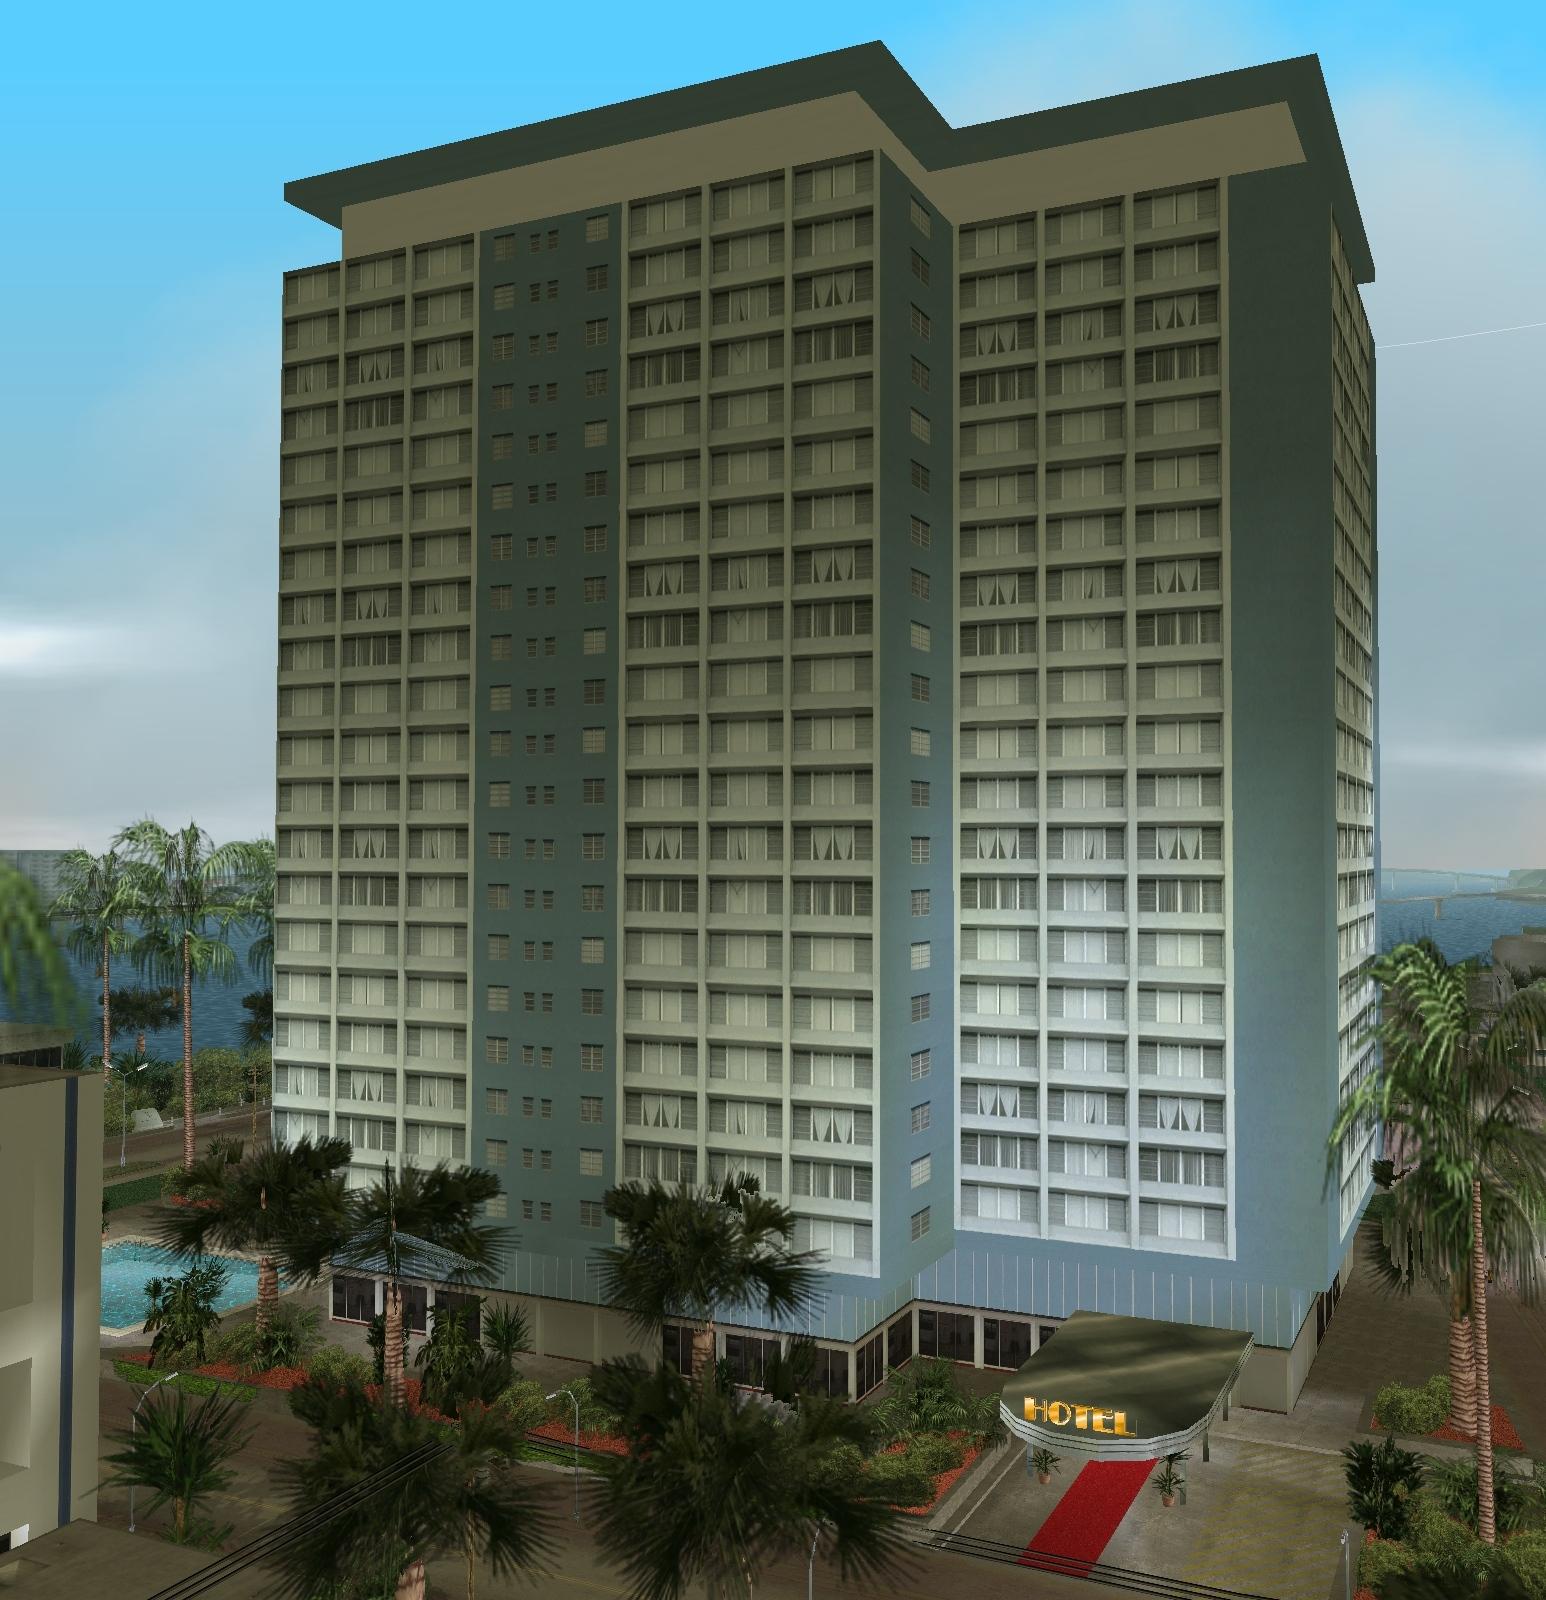 Hotel w Ocean Beach